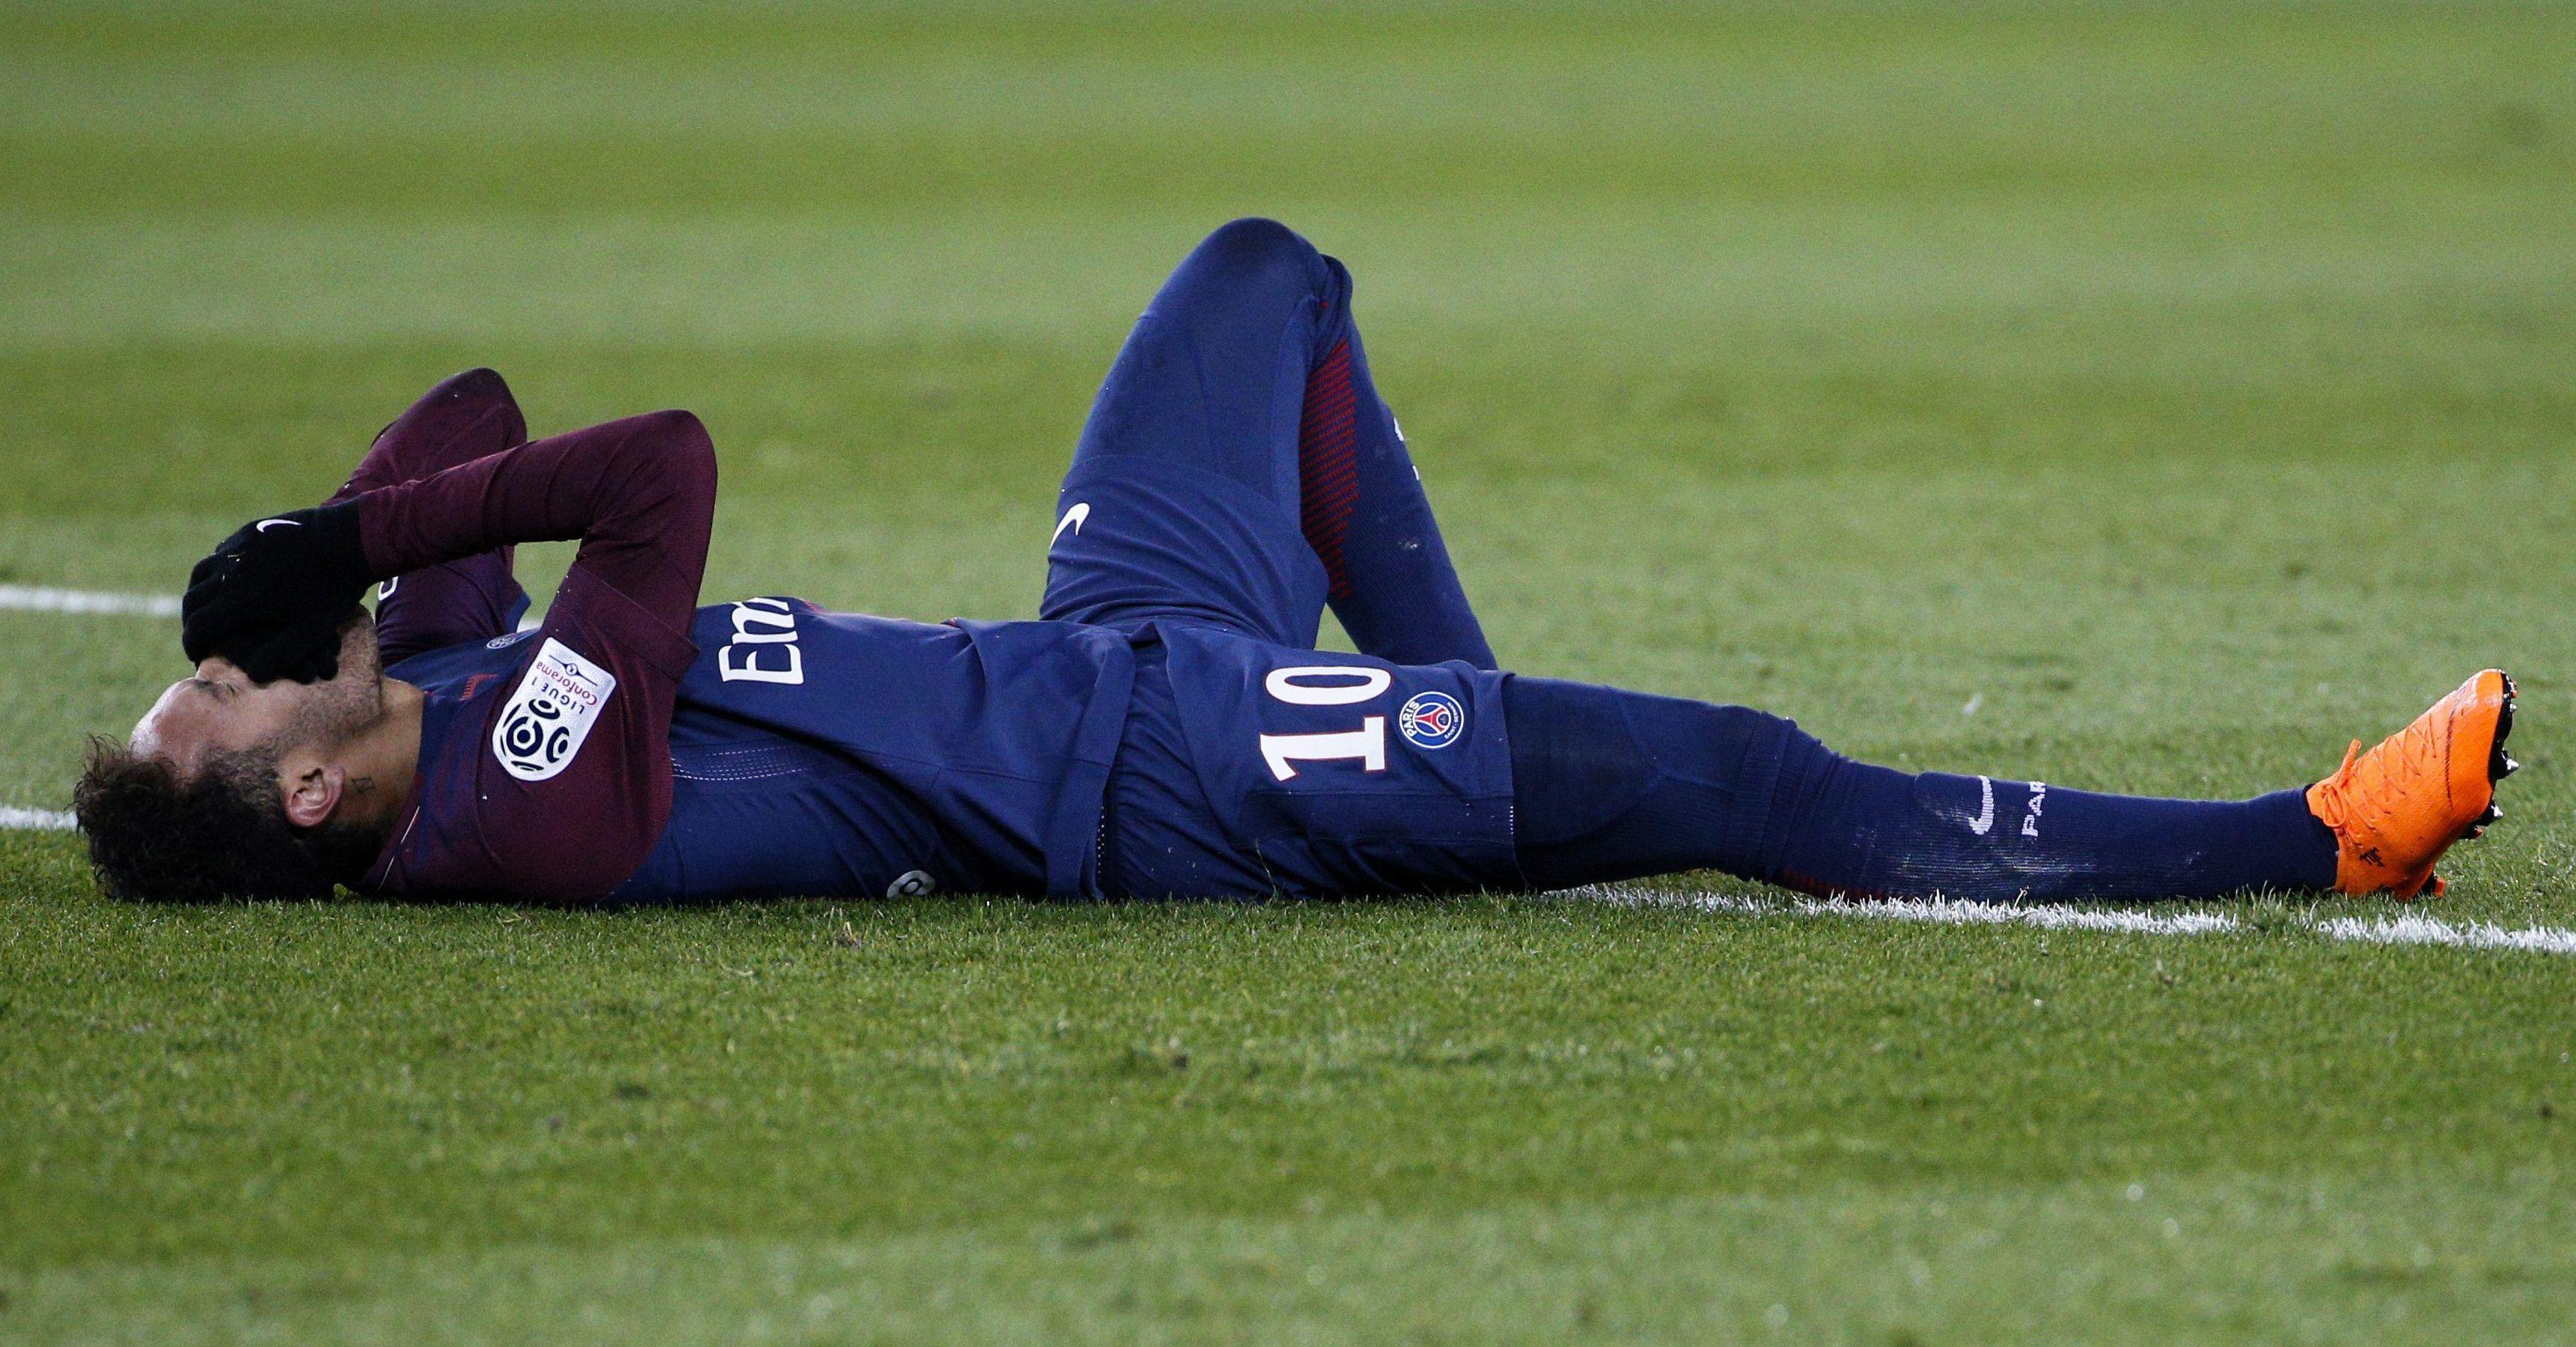 Neymar's injury has overshadowed the upcoming second-leg